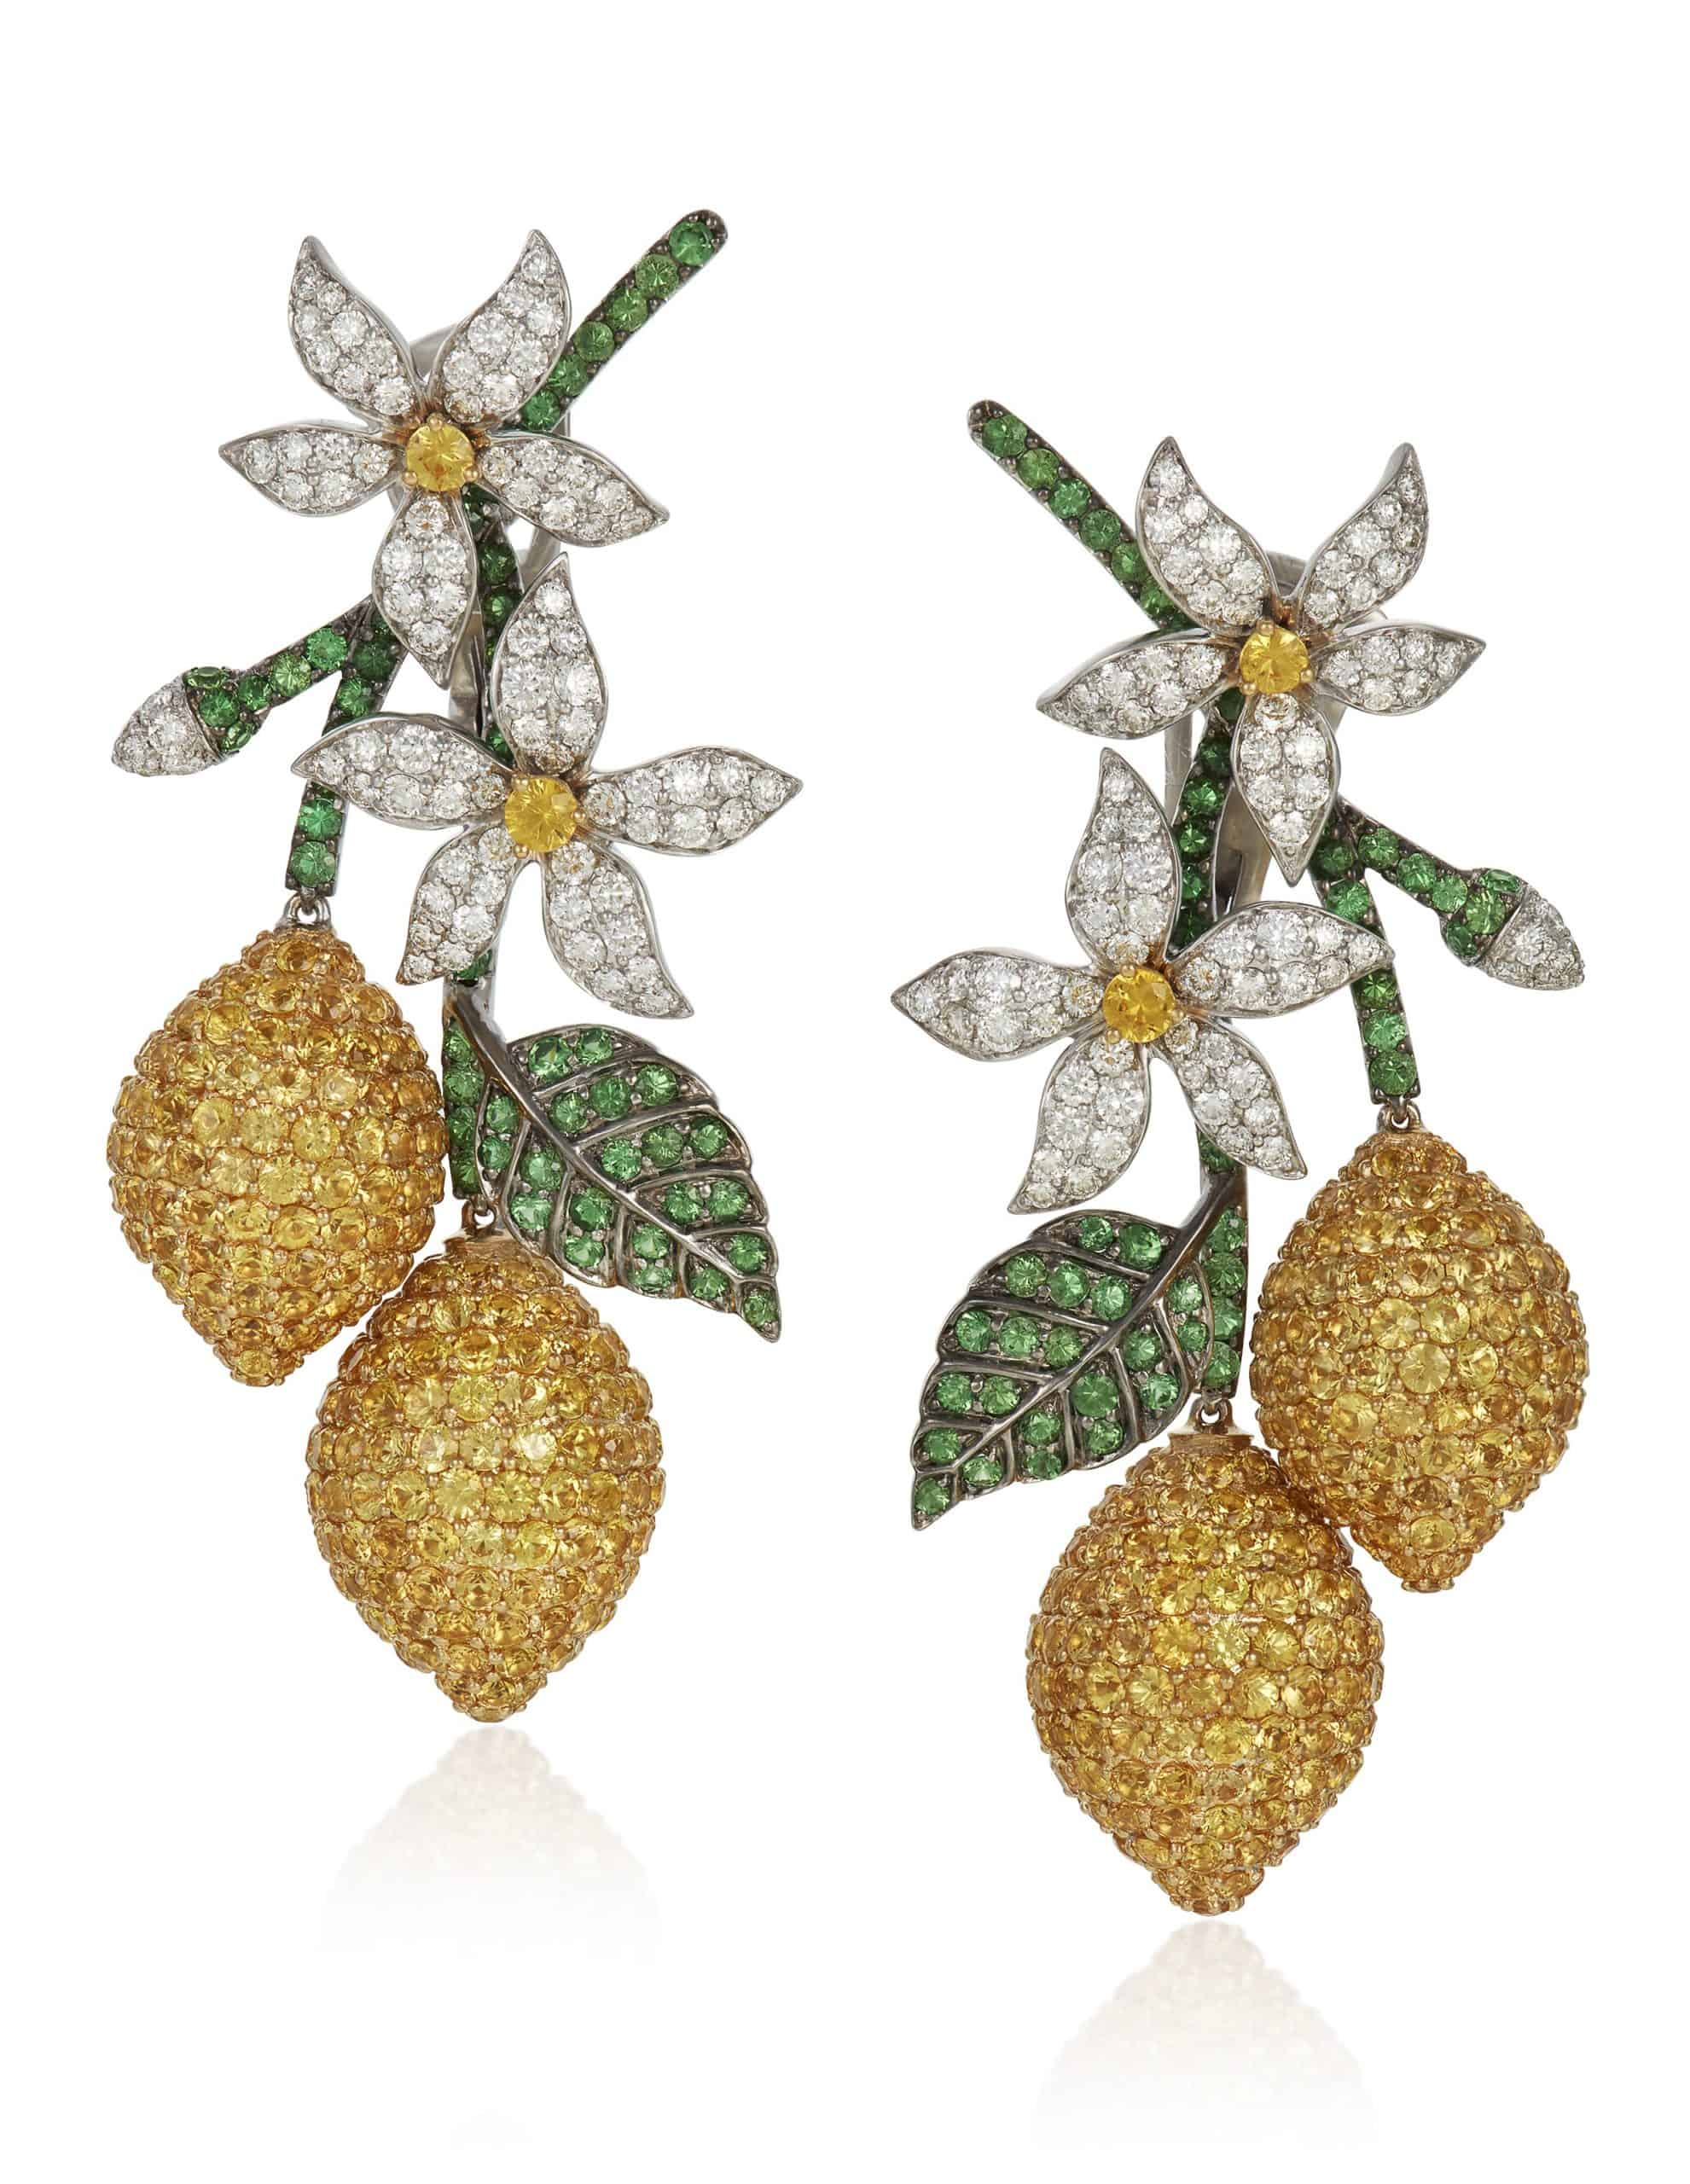 MICHELE DELLA VALLE, YELLOW SAPPHIRE, TSAVORITE GARNET AND DIAMOND EARRINGS